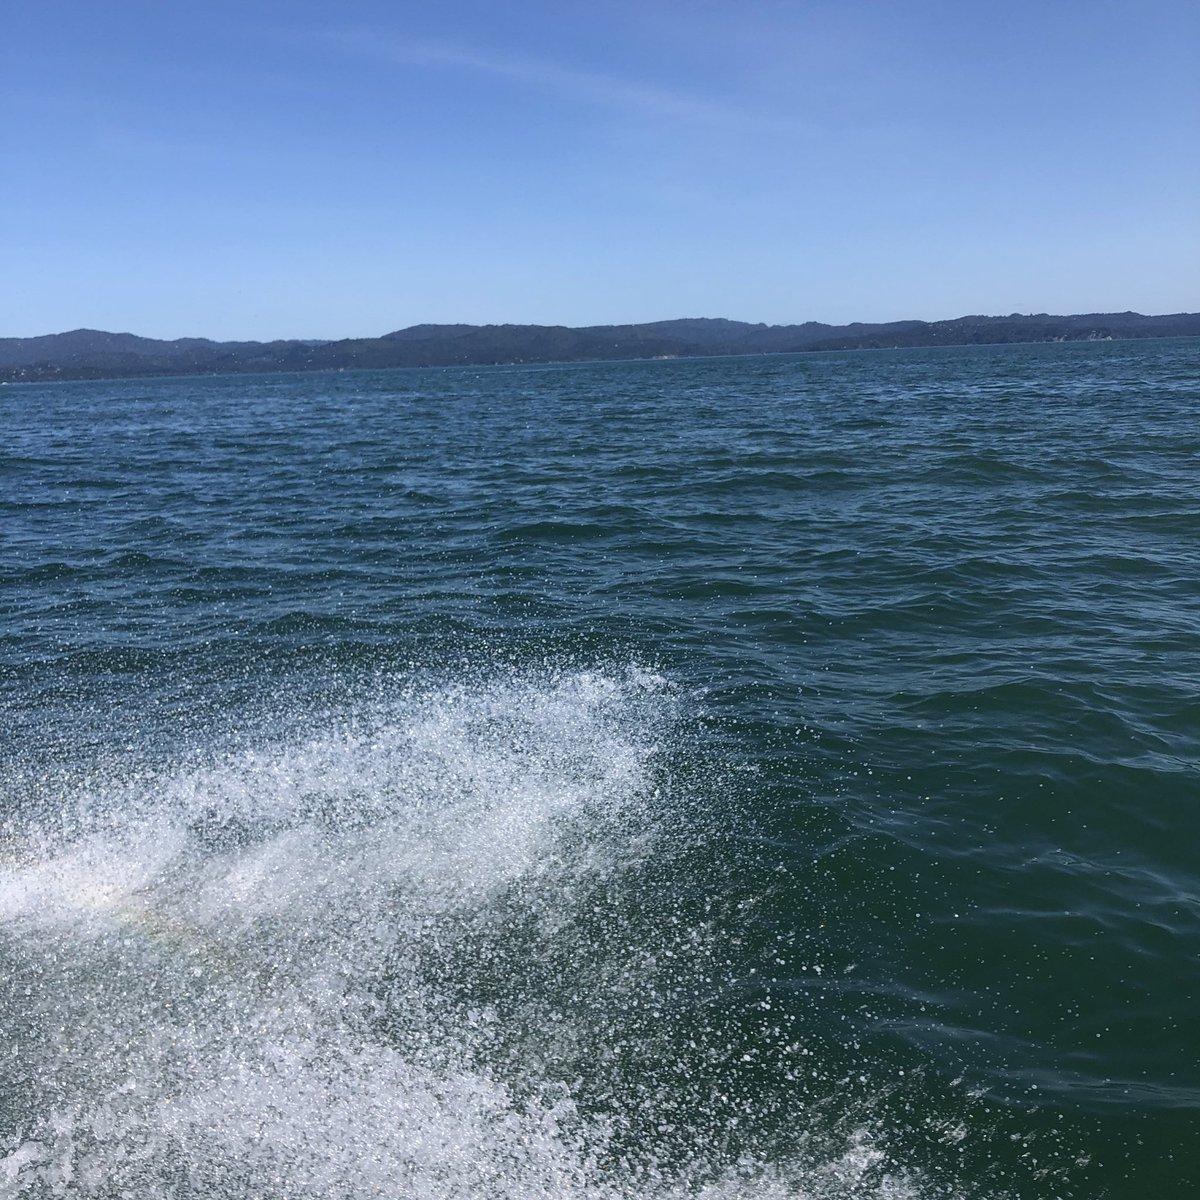 when the sea spray looks like a great white shark